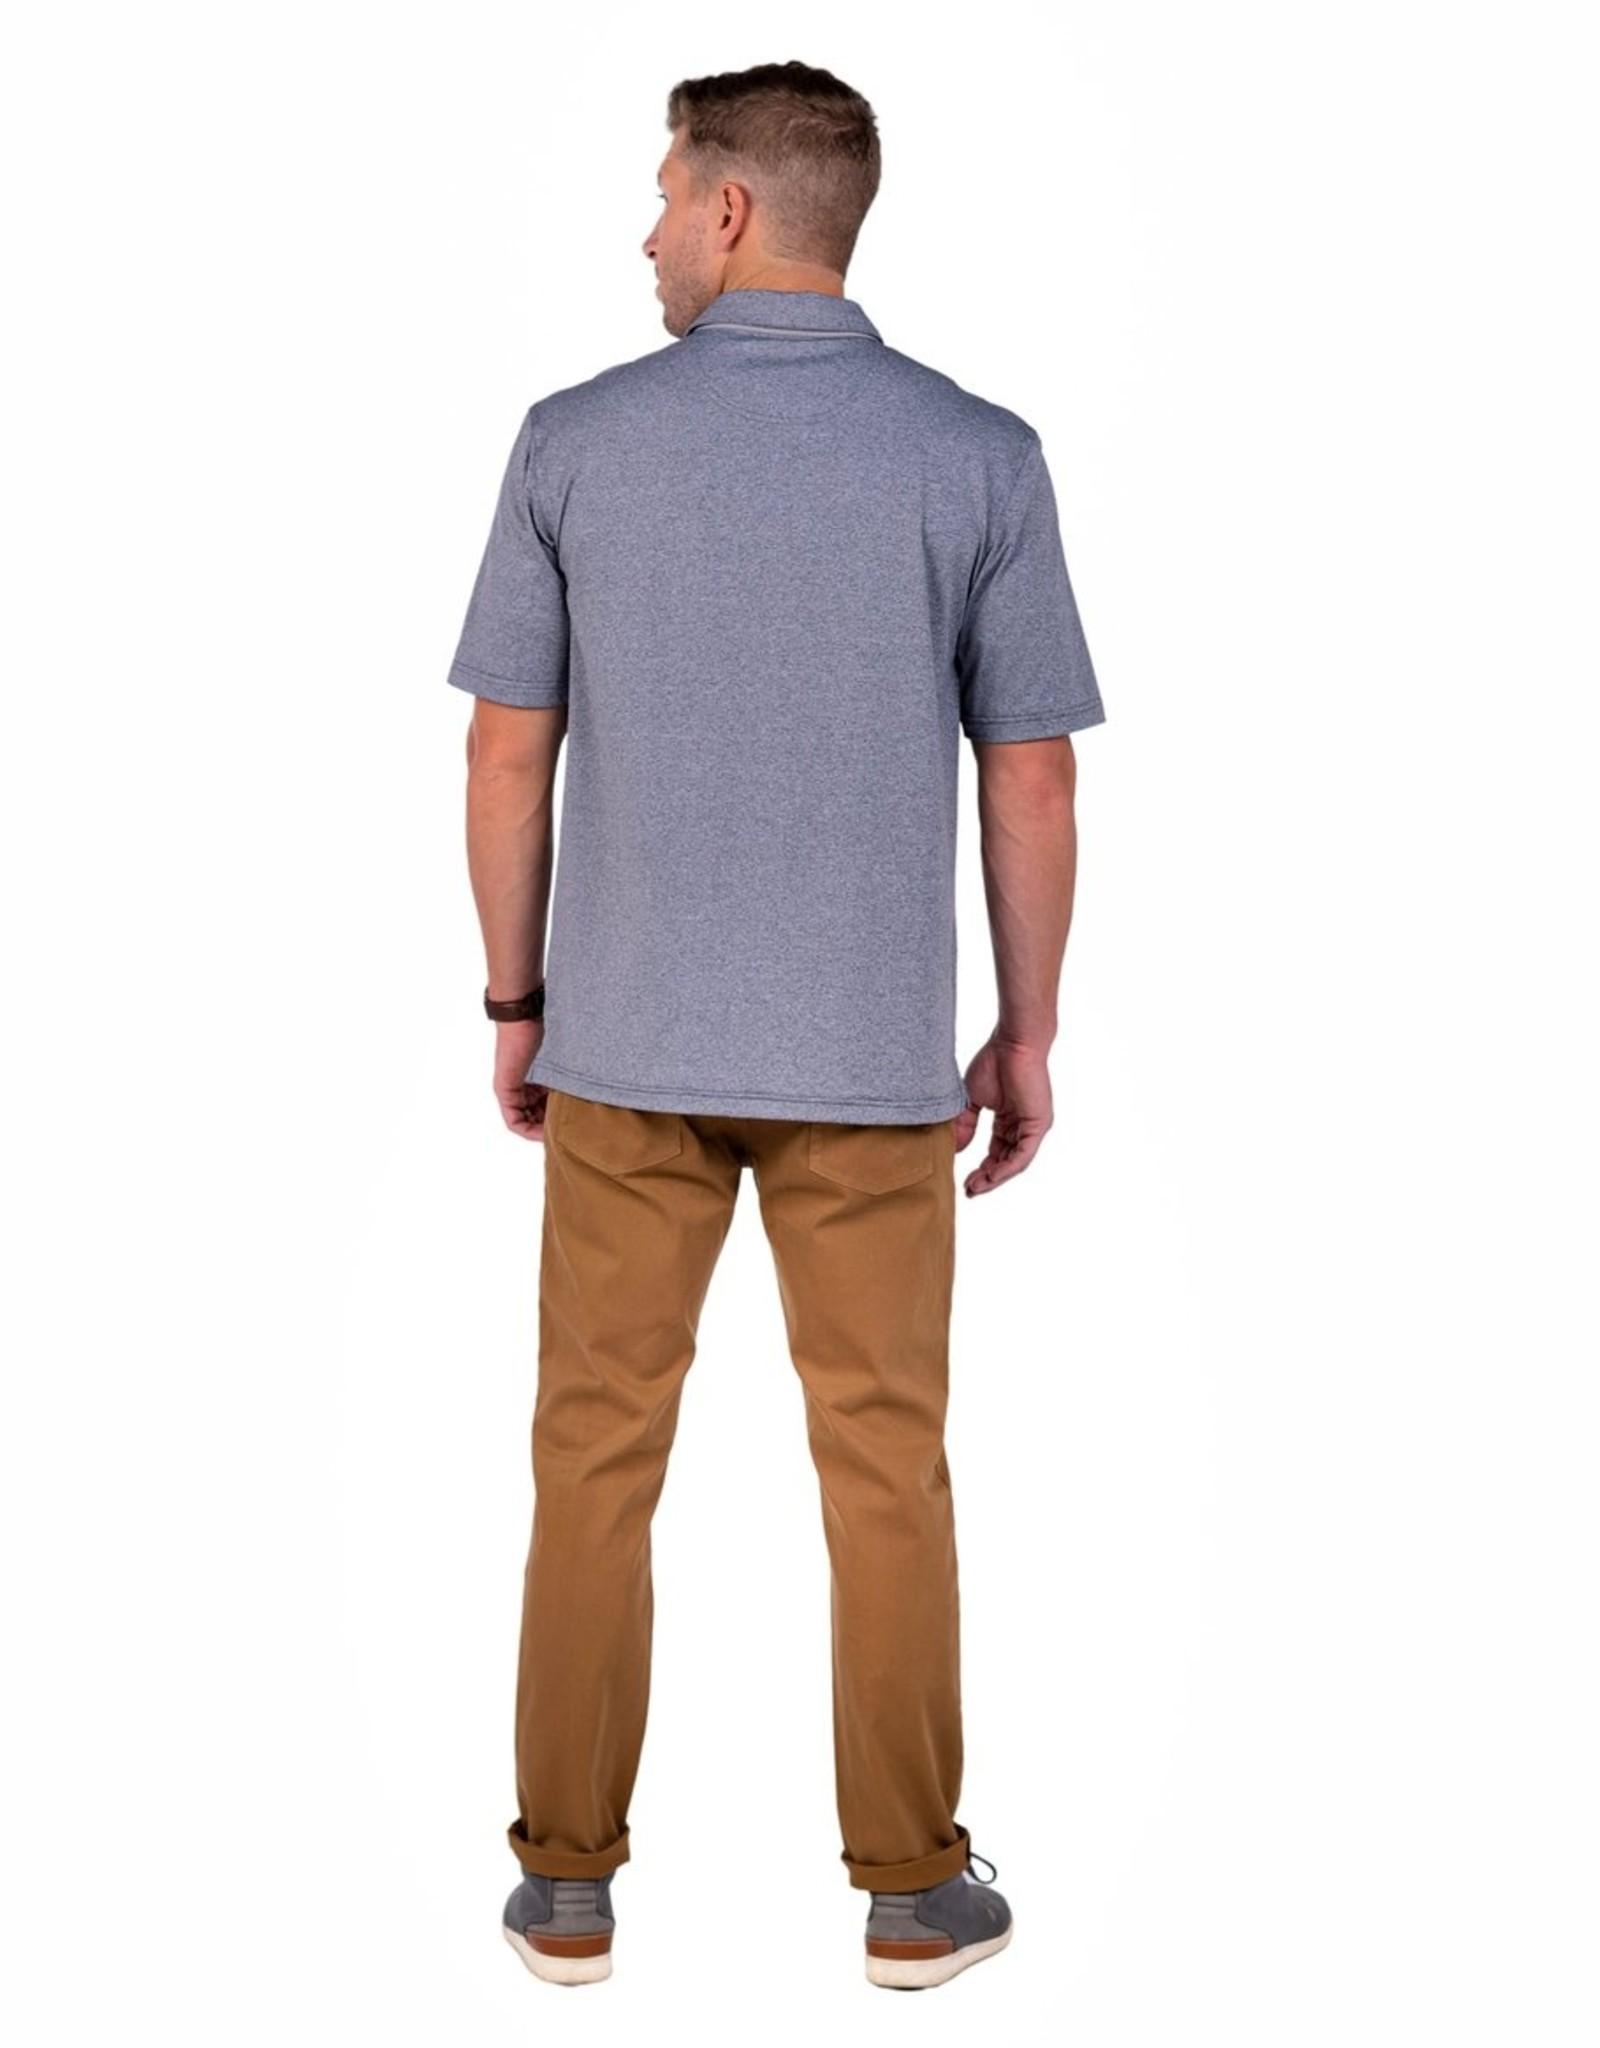 Southern Shirt Grayton Heather Polo